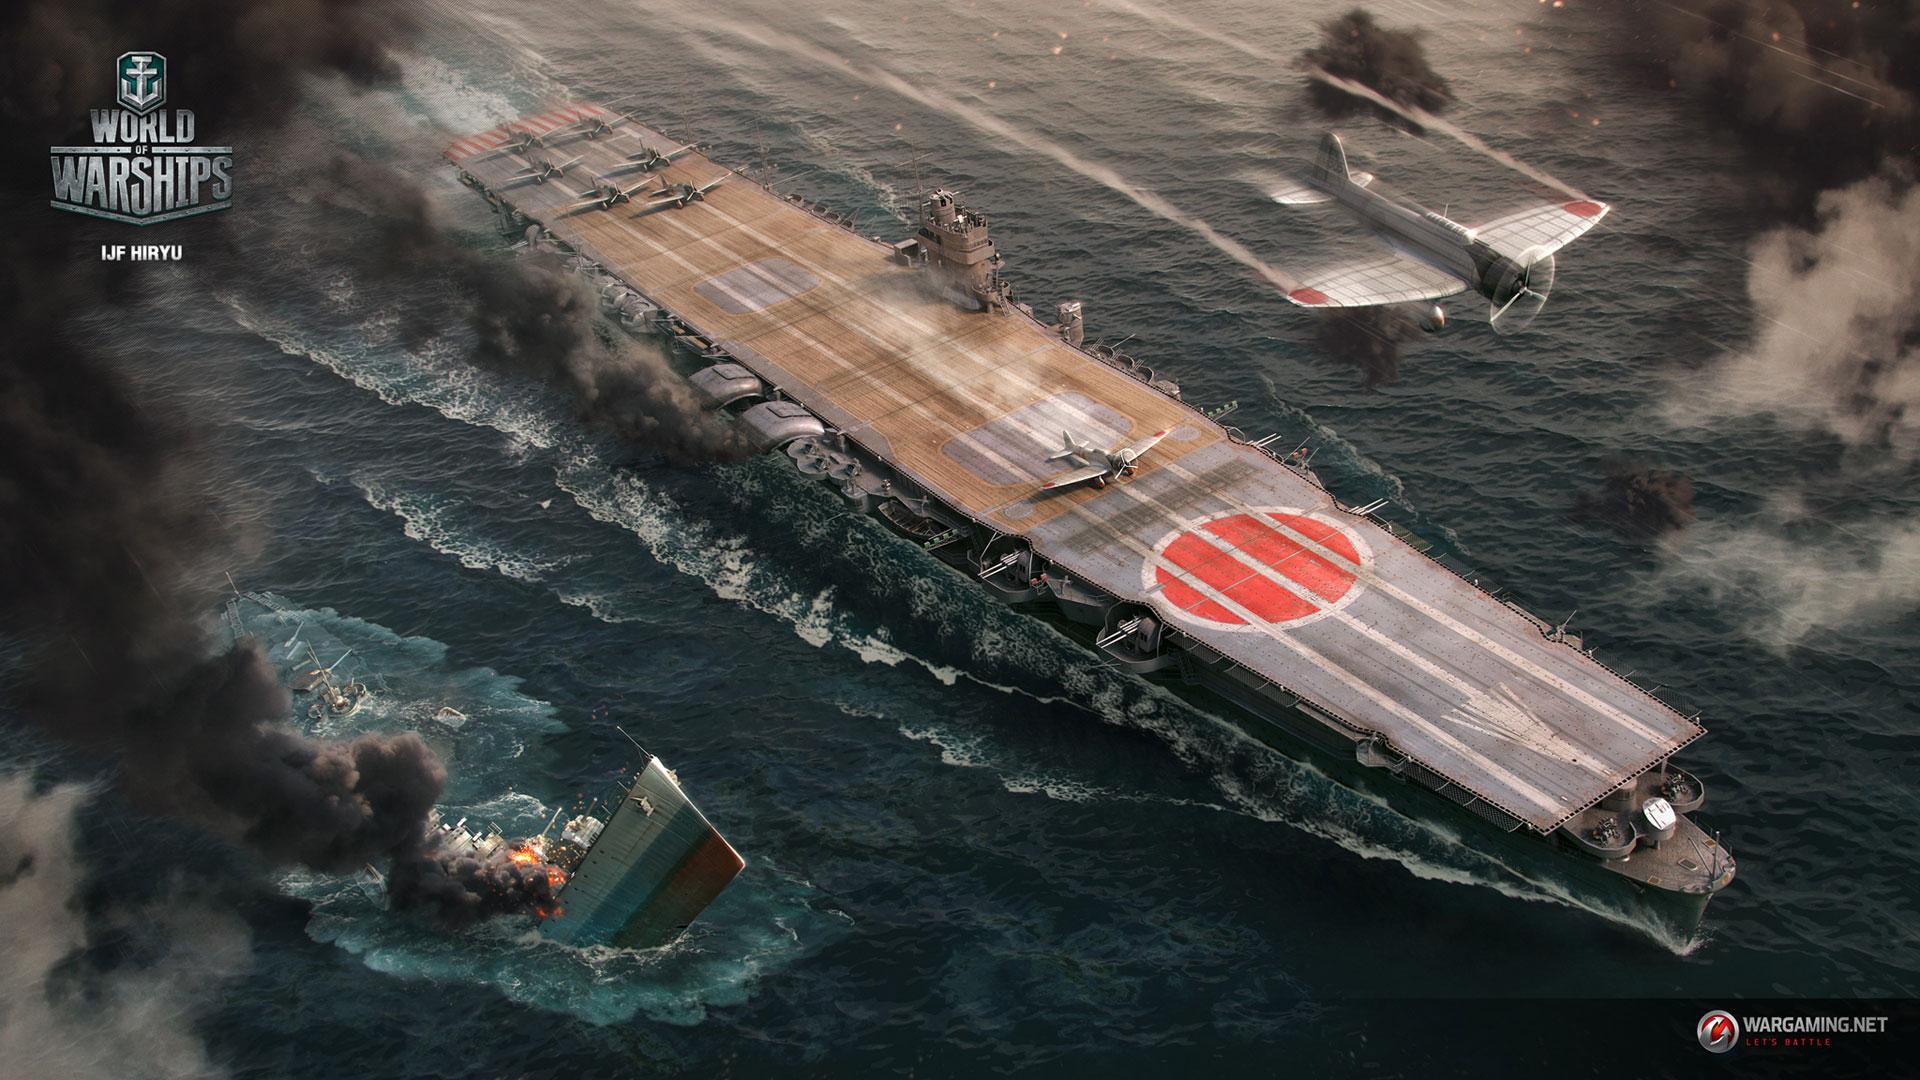 world of warships wallpaper 1600x900